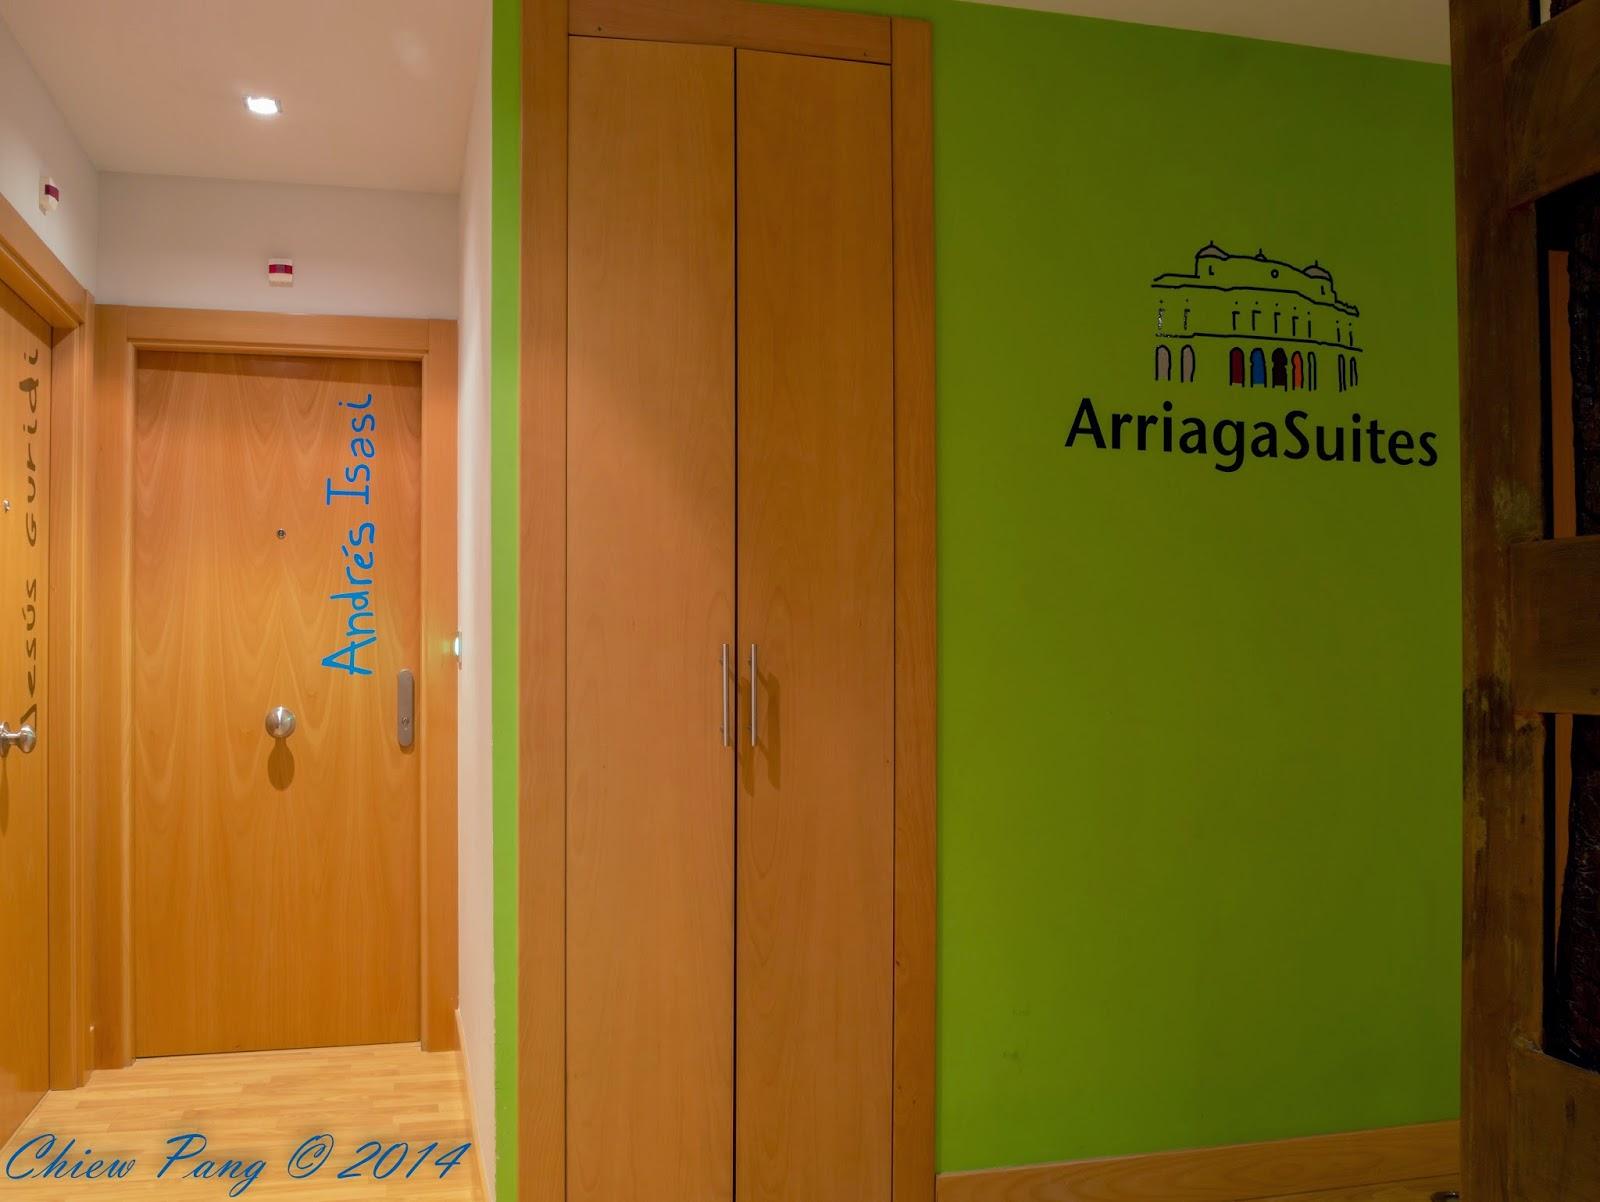 Arriaga Suites, Bilbao